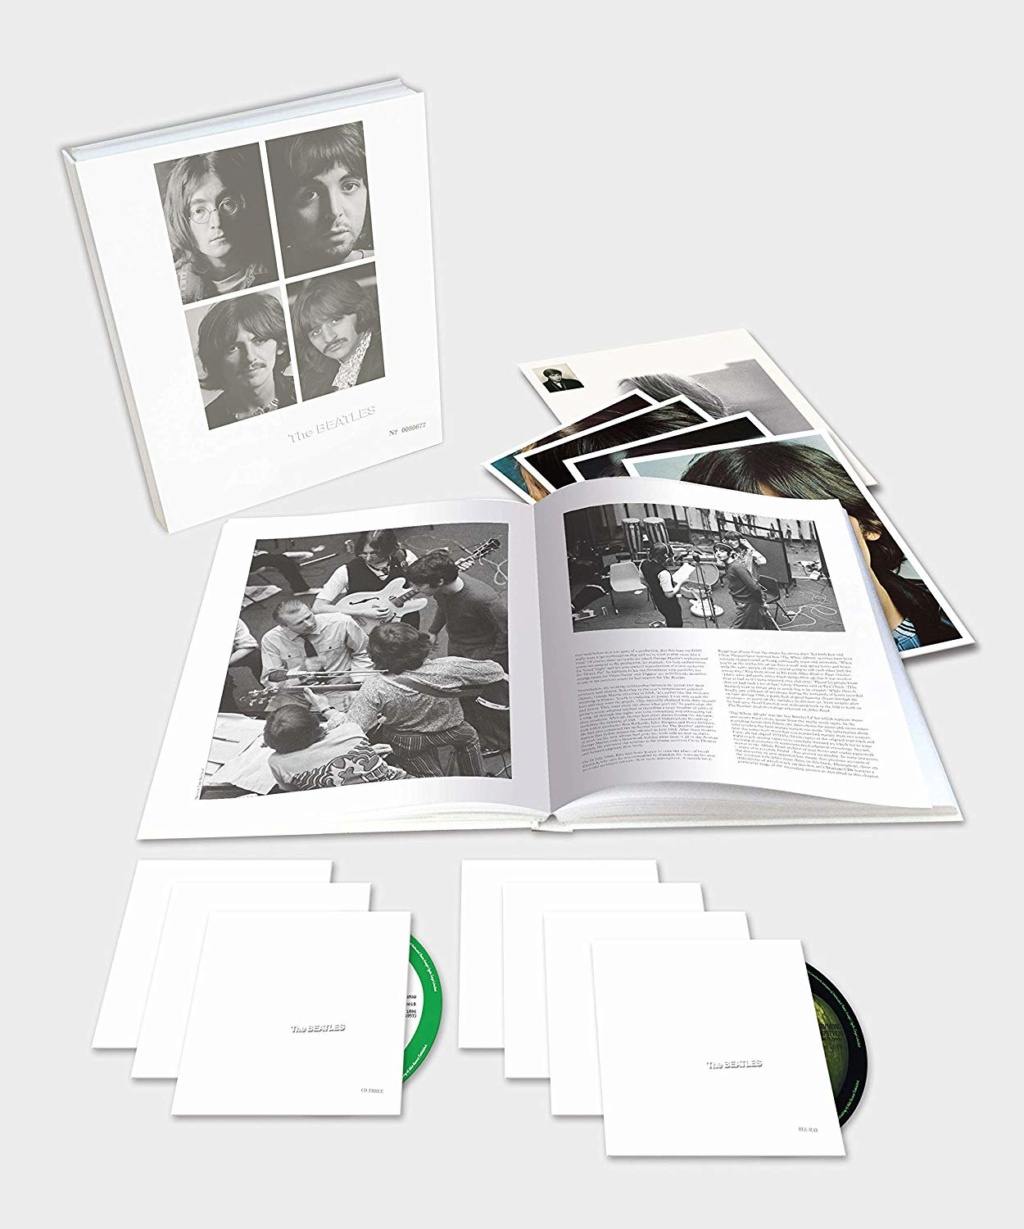 Johnny Hallyday/Beatles - Page 7 81h21i10